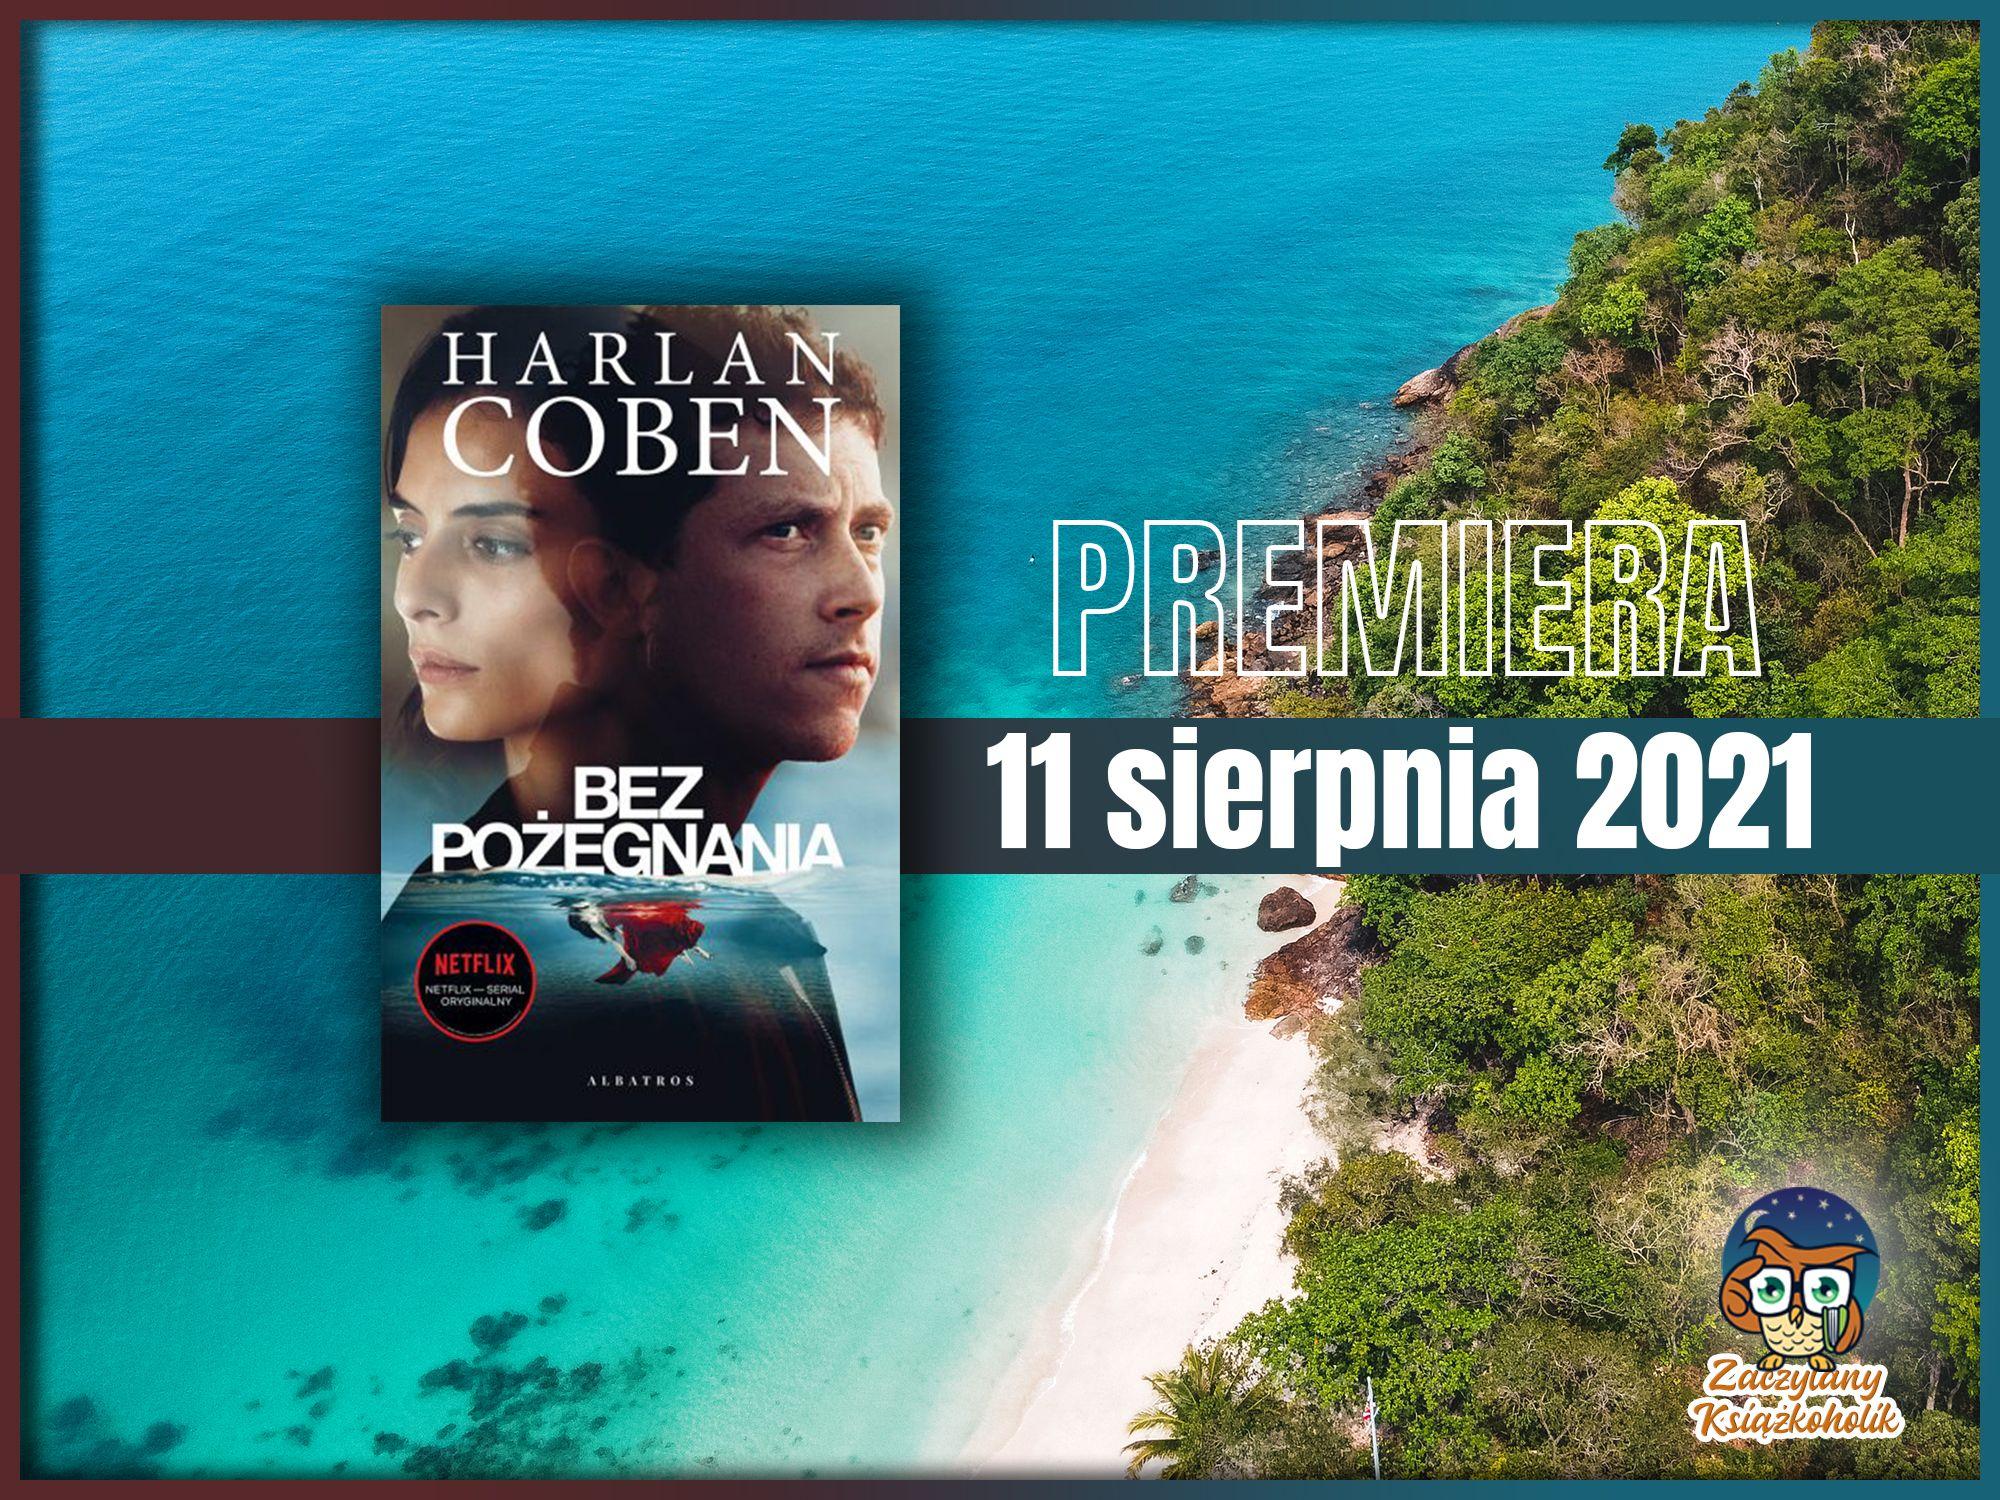 Bez pożegnania, Harlan Coben, zaczytanyksiazkoholik.pl